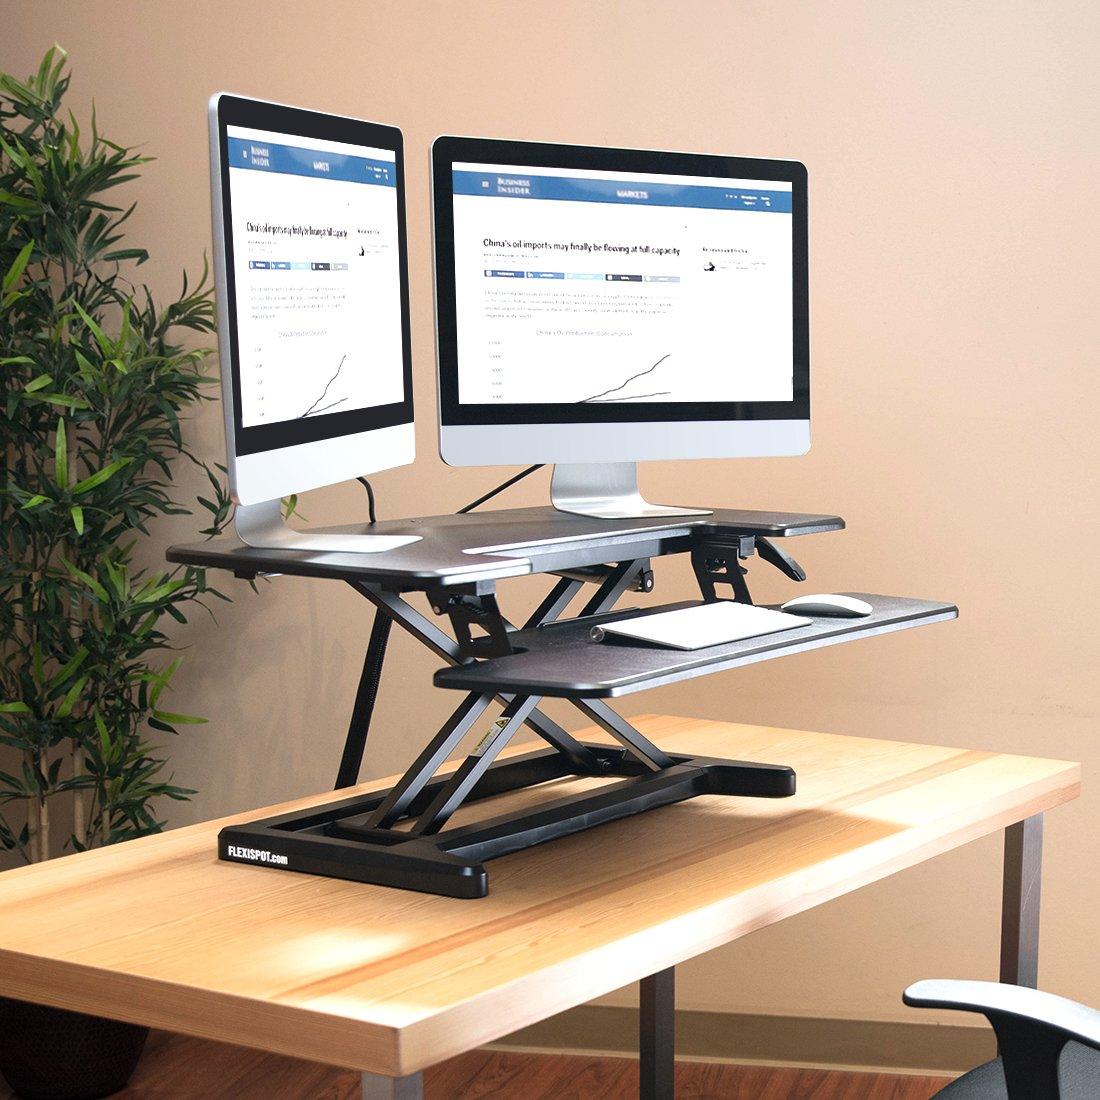 FlexiSpot Standing Desk Hight Adjustable Desk Riser